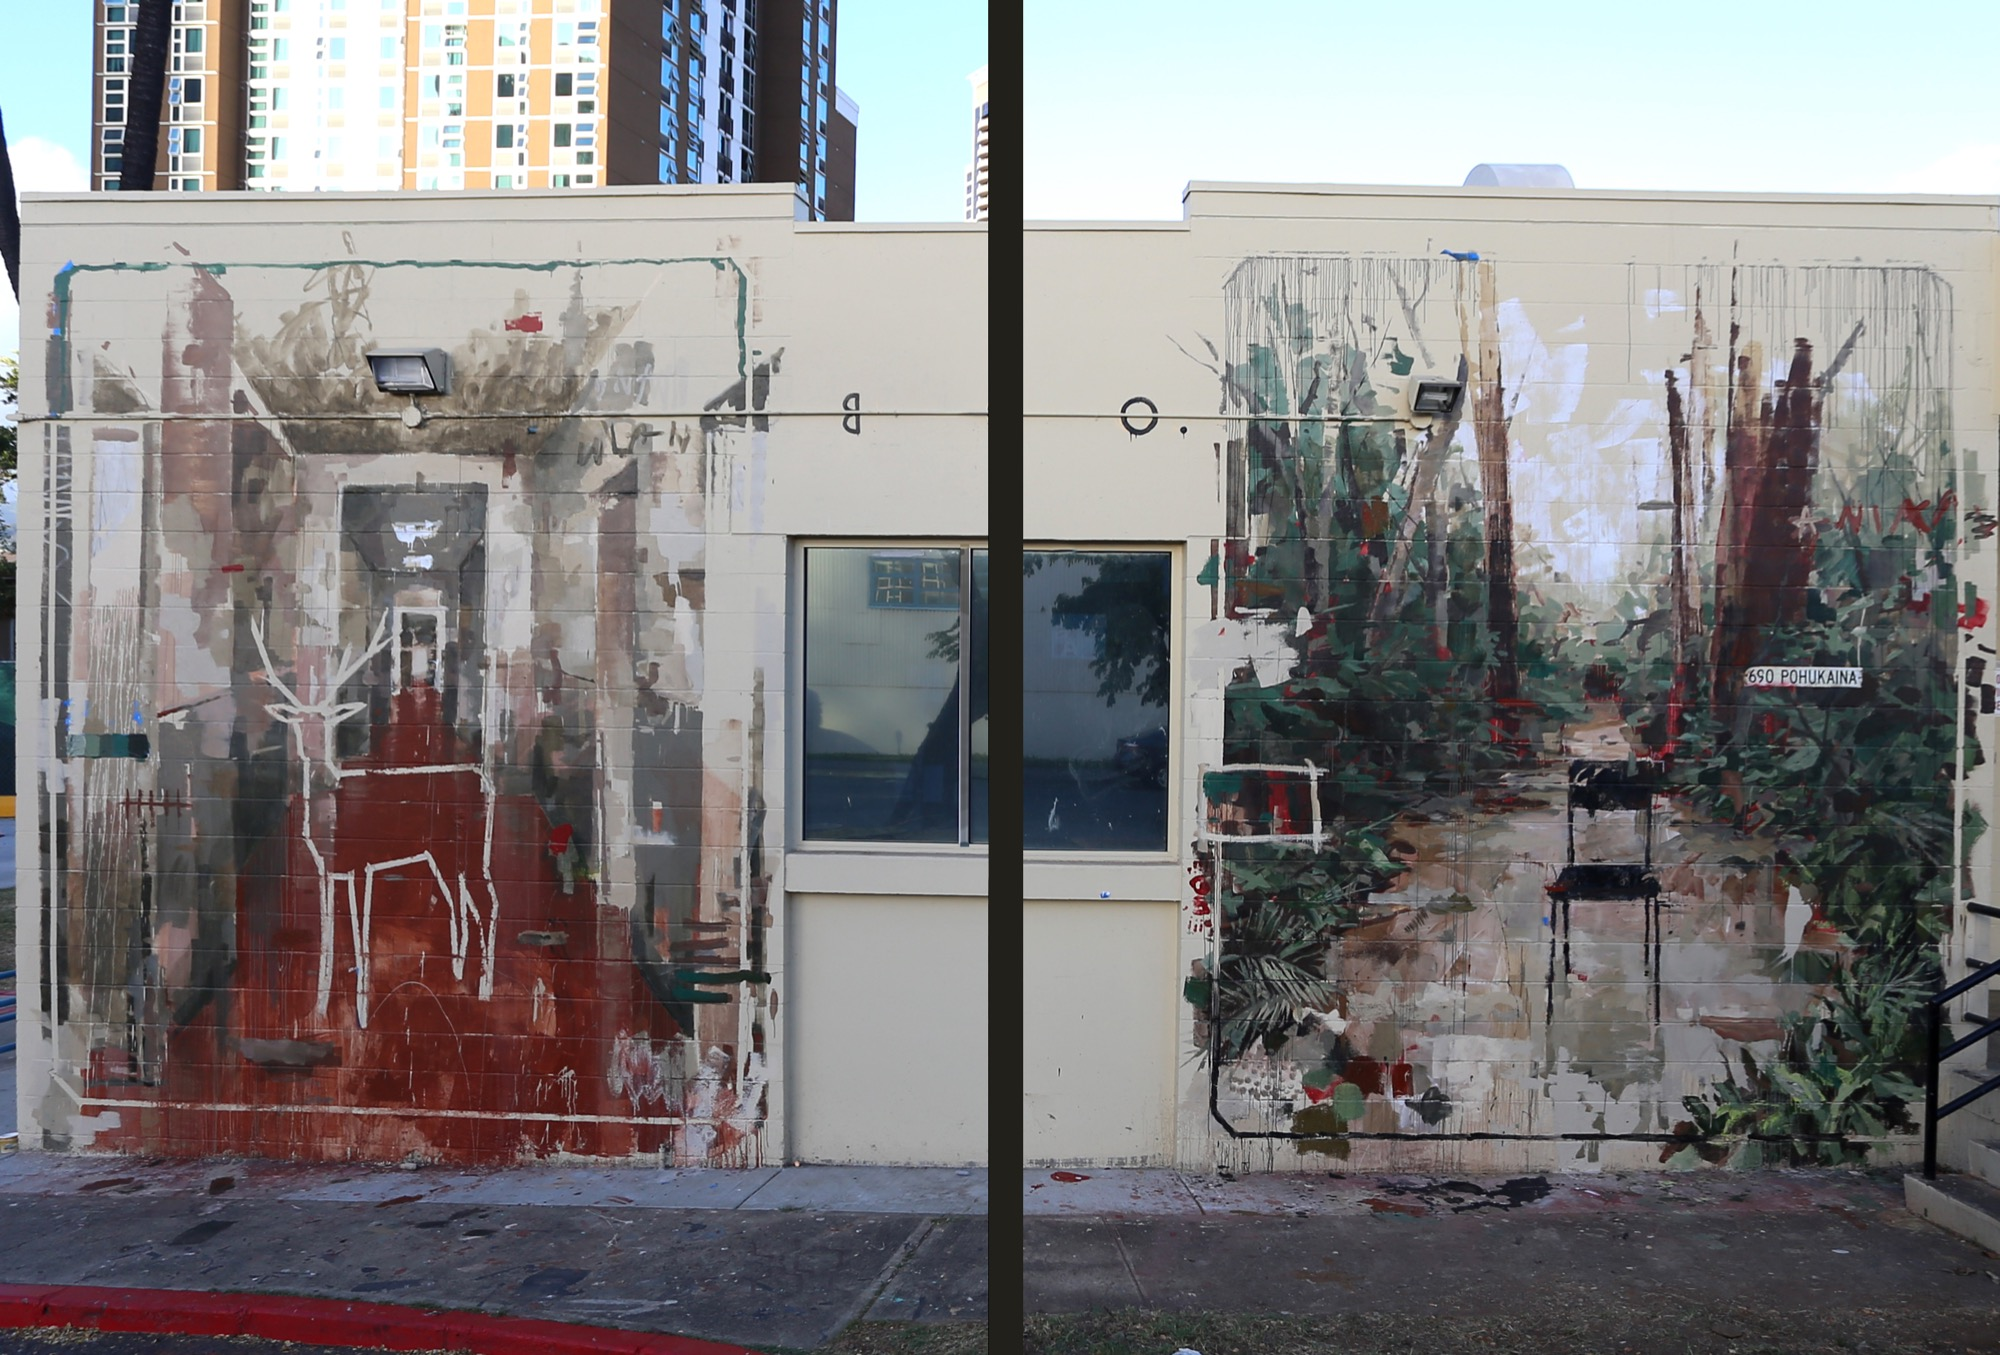 borondo-justkids-pow-wow-hawaii-mural-grafite-dionisio-arte (2)